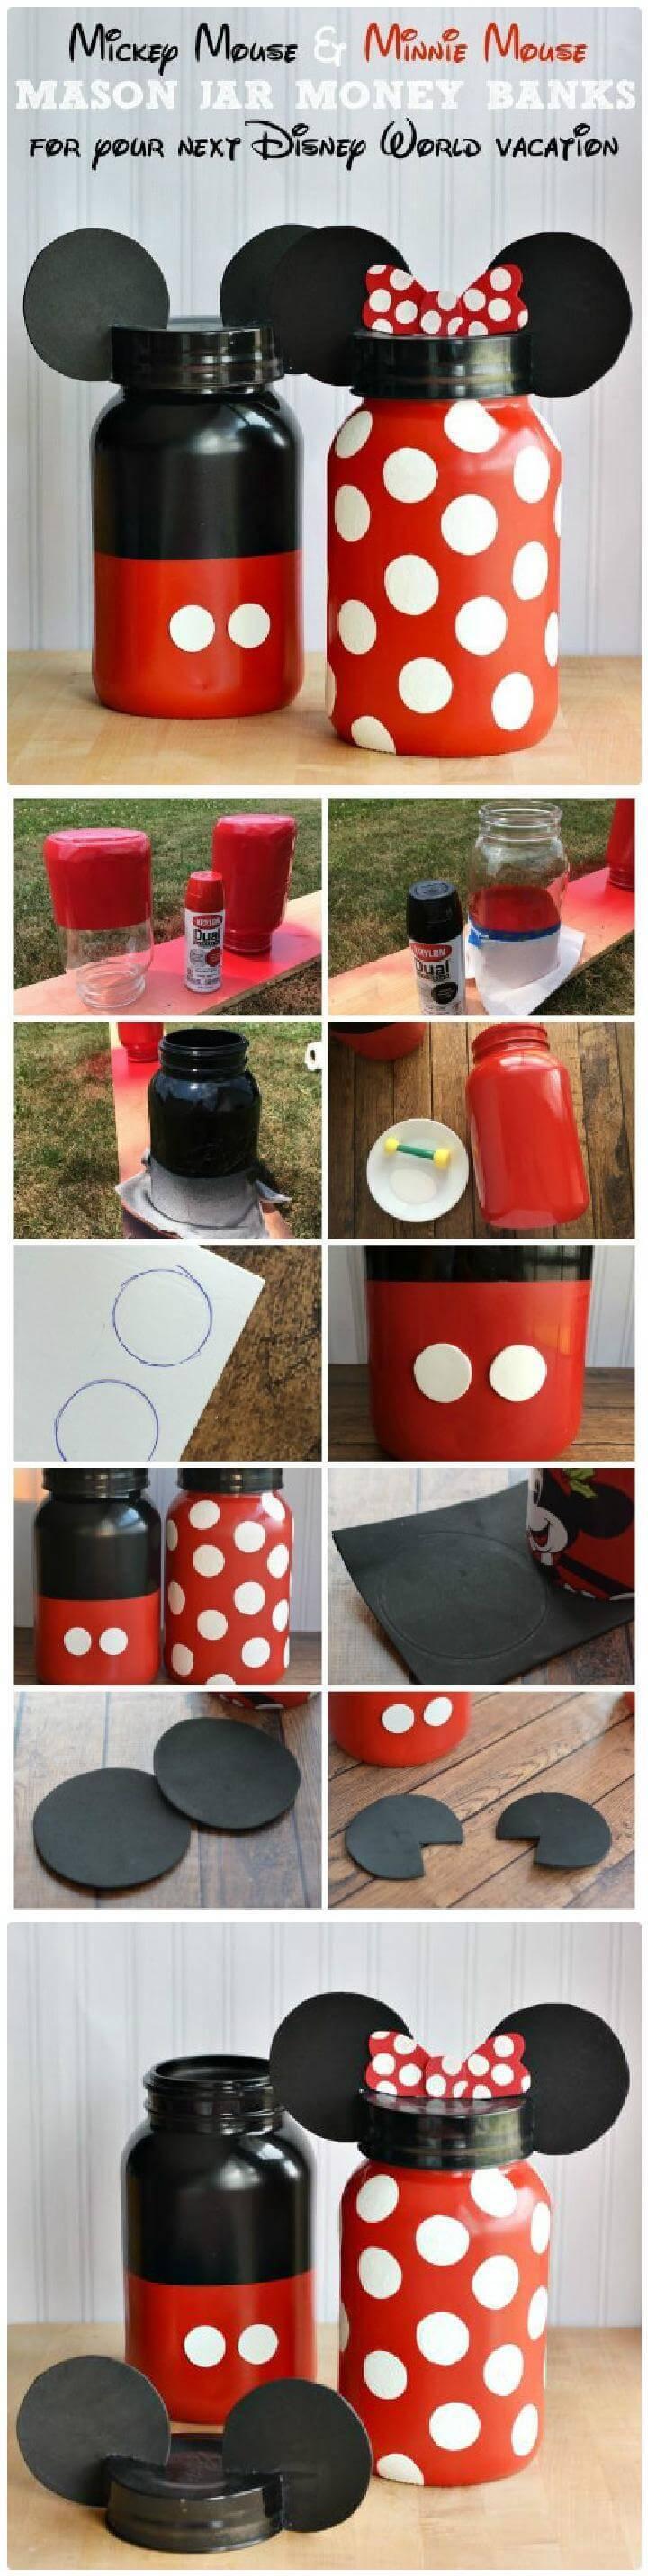 DIY Adorable Minnie and Mickey Mouse Mason Jar Money Banks